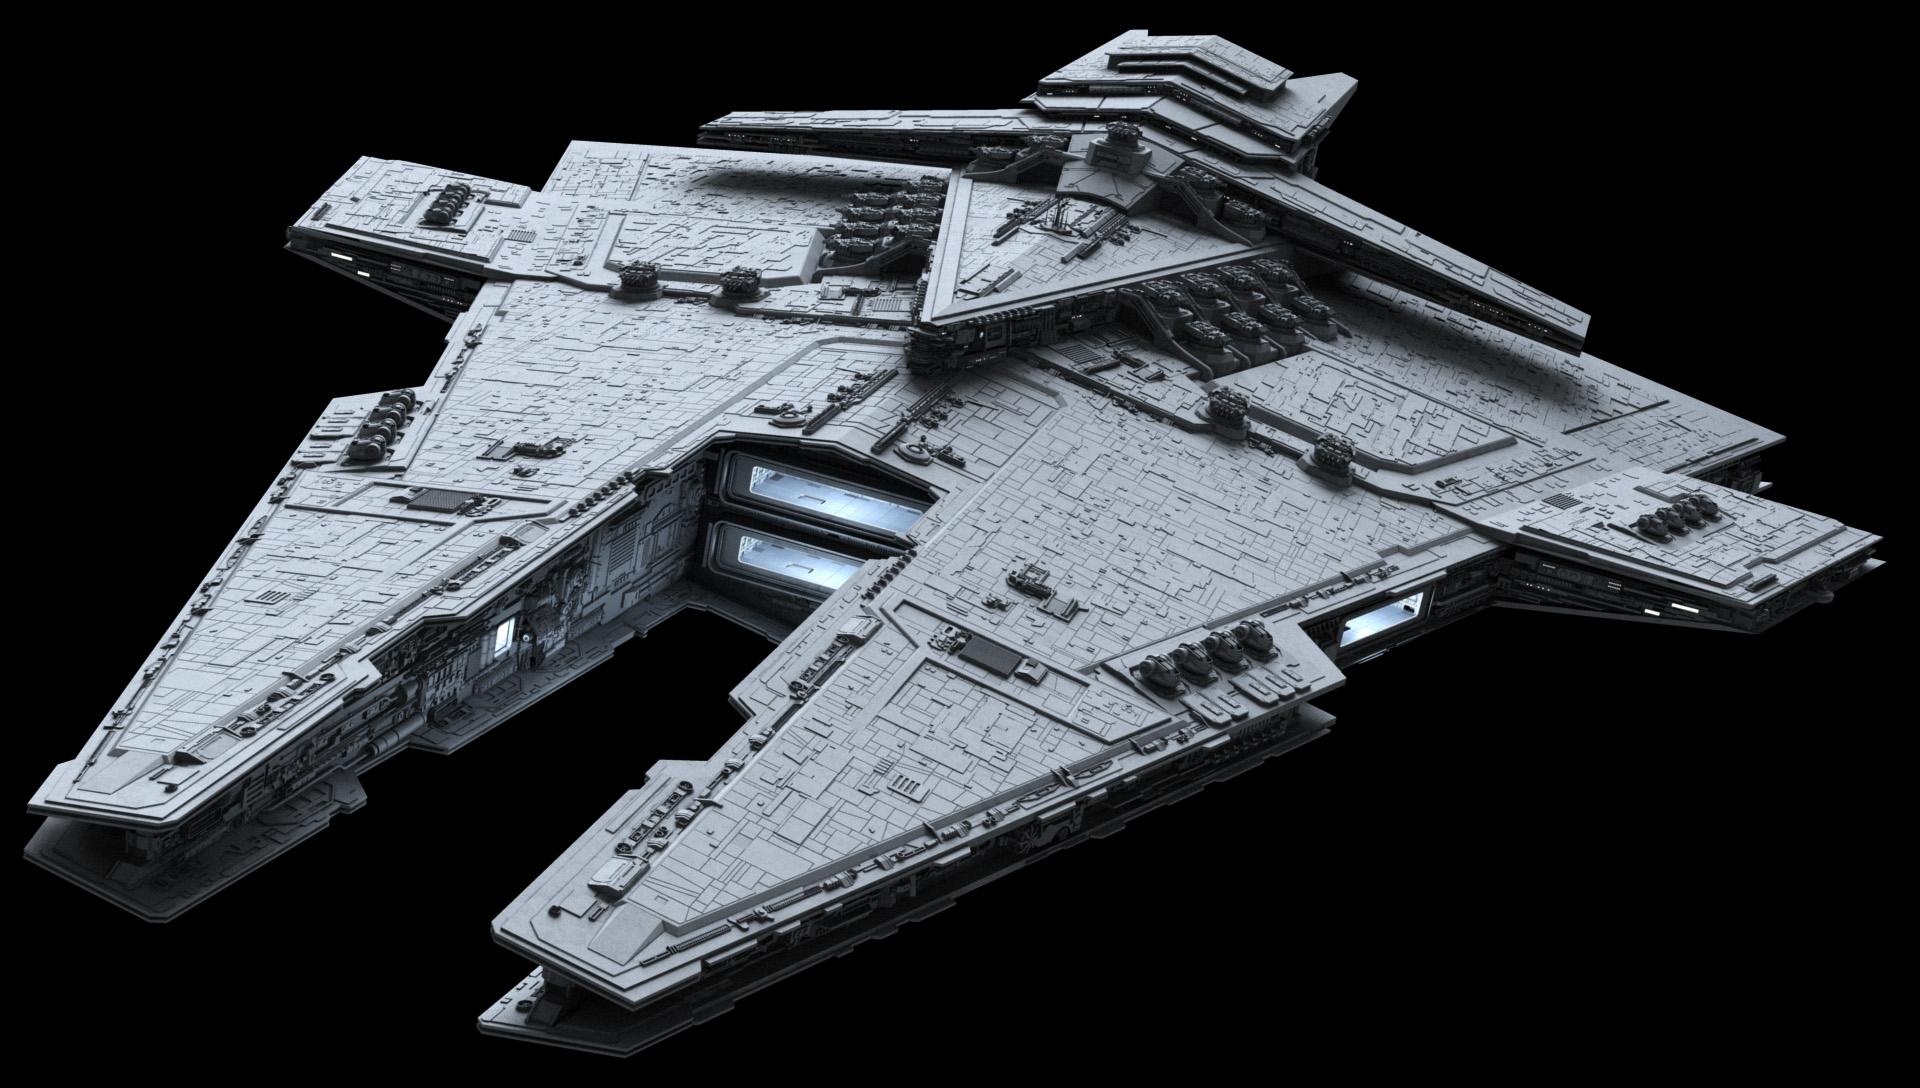 Spaceship Battle Wallpaper Star Wars Spaceship Wallpaper